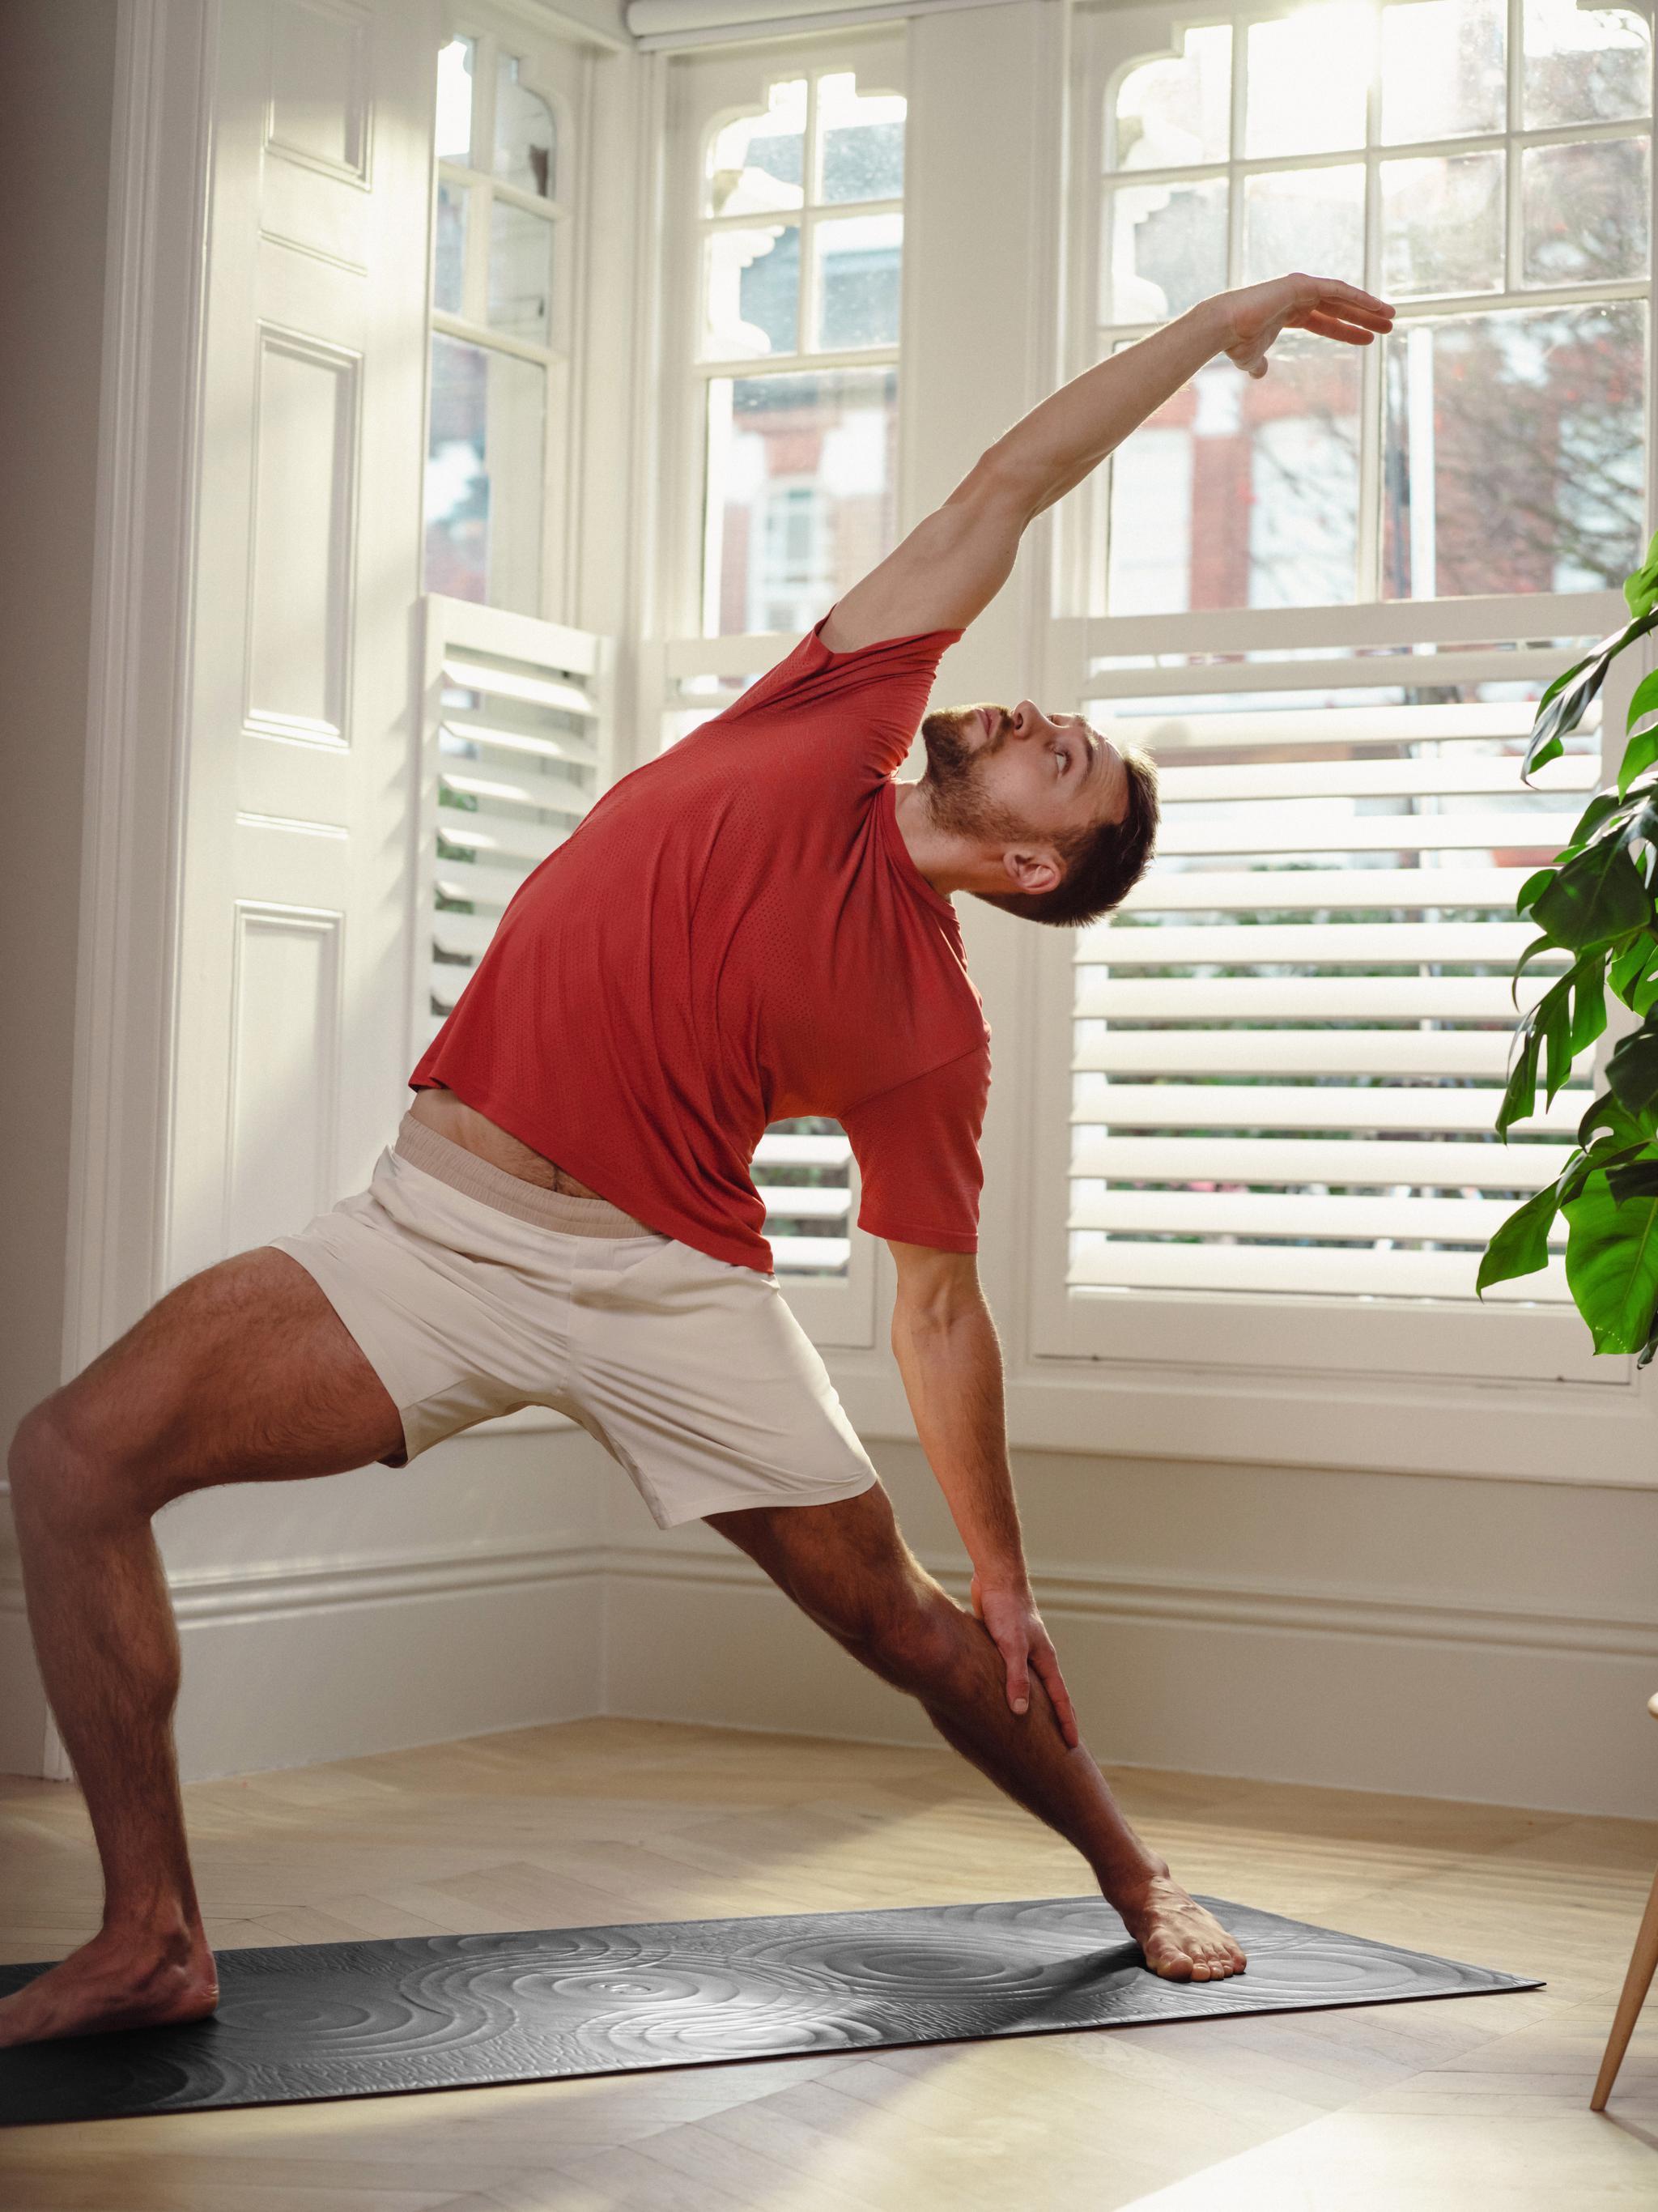 lululemon推出全新Take Form 3D瑜伽垫……